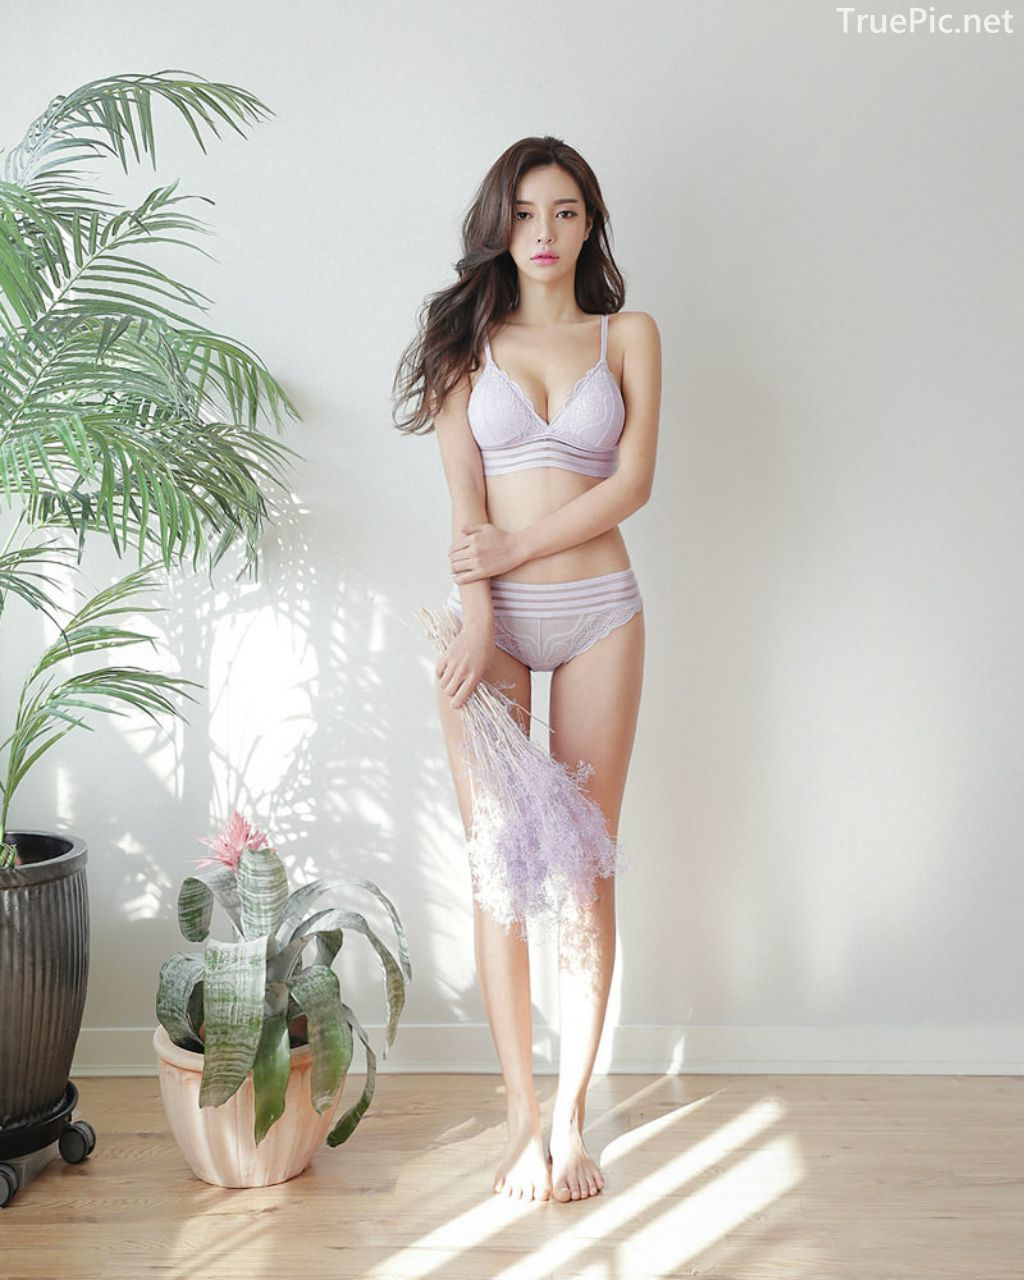 Jin Hee Korean Fashion Model - Love Me Lingerie Collection - TruePic.net - Picture 6